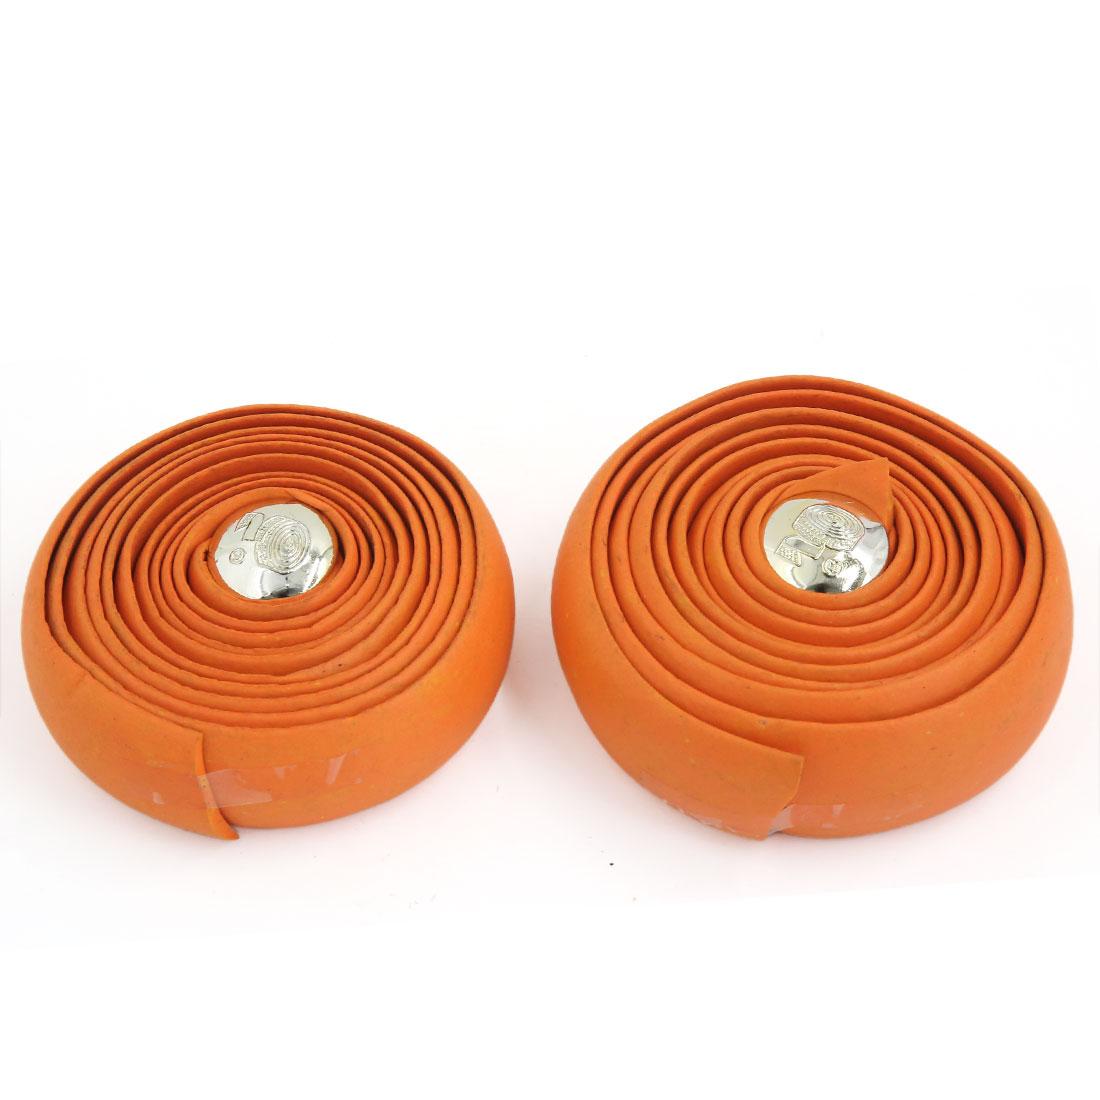 Pair Orange Foam Anti Slip Bar Padded Wrap Handlebar Tape for Bike Fixed Gear